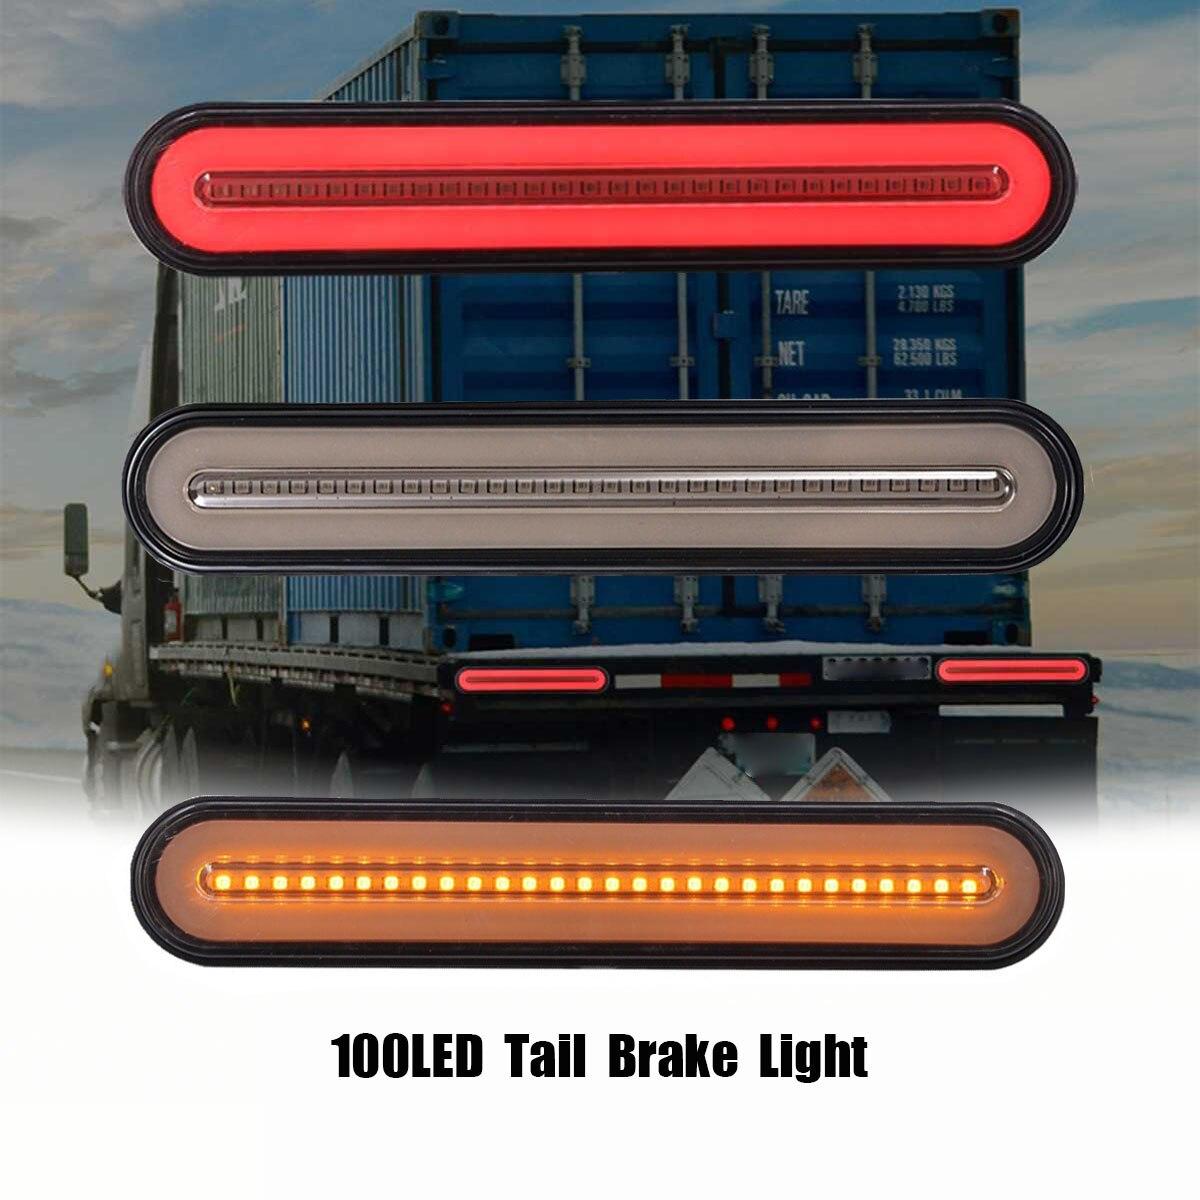 2x 3 in1 Neon À Prova D' Água LEVOU Luz de Freio Do Caminhão Reboque de Halo Anel Da Cauda Brake Parar Luz Por Sua Vez Sinal de Fluxo Seqüencial a Lâmpada de luz